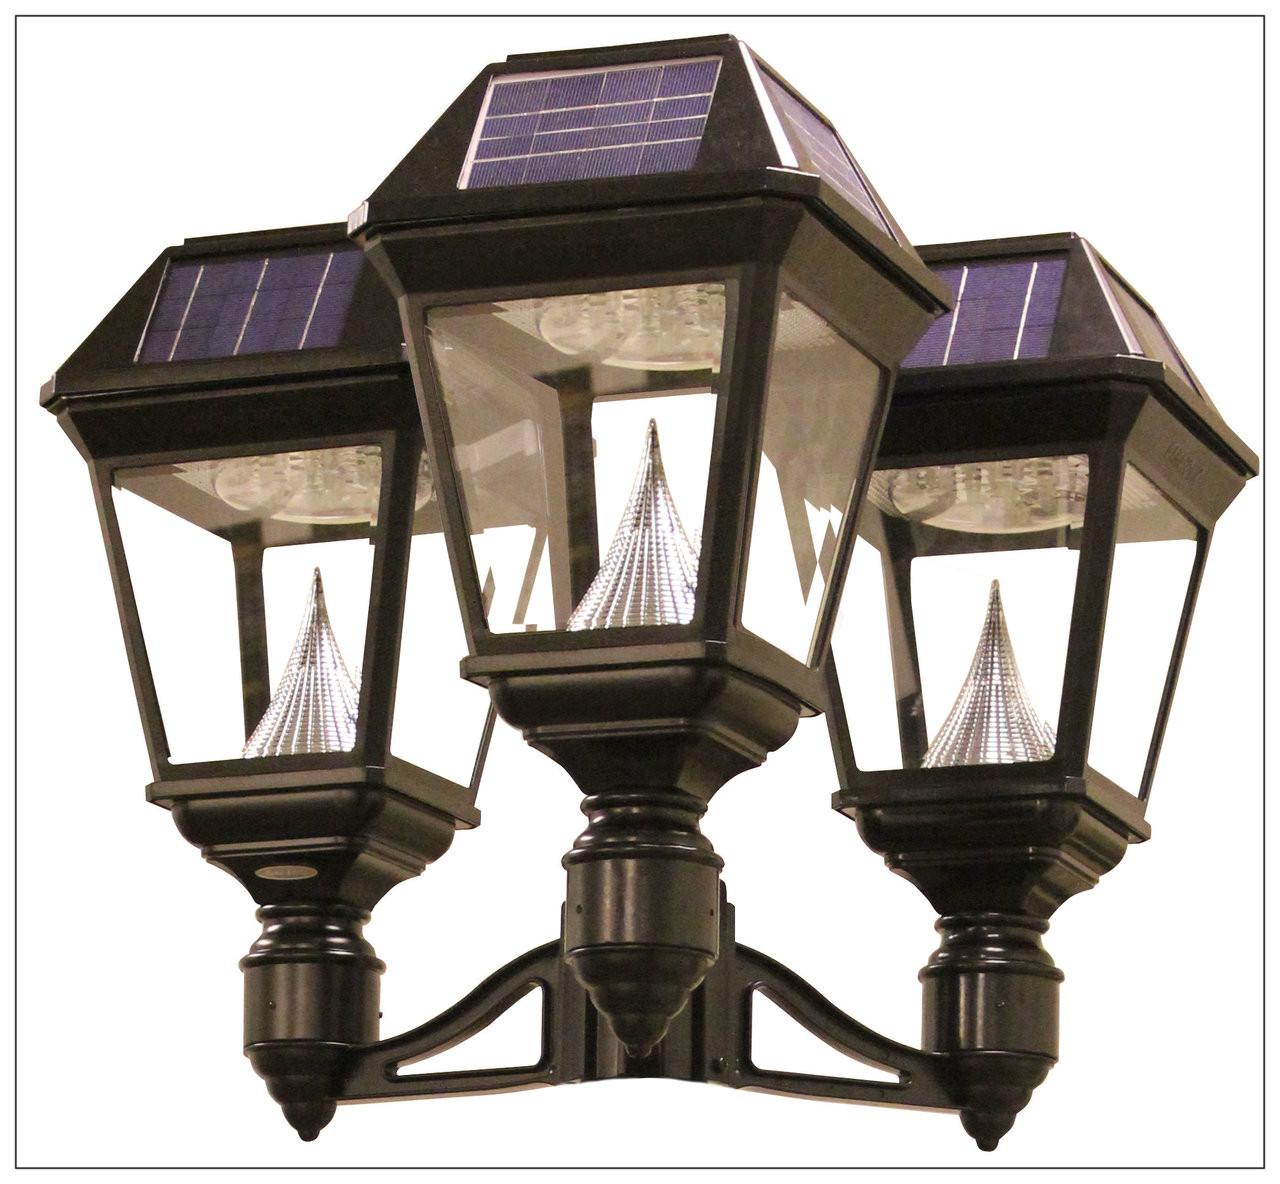 info for fb38c ed0c8 Solar Lamp Post Light Fixture, Bright 900 Lumens, Gama Sonic